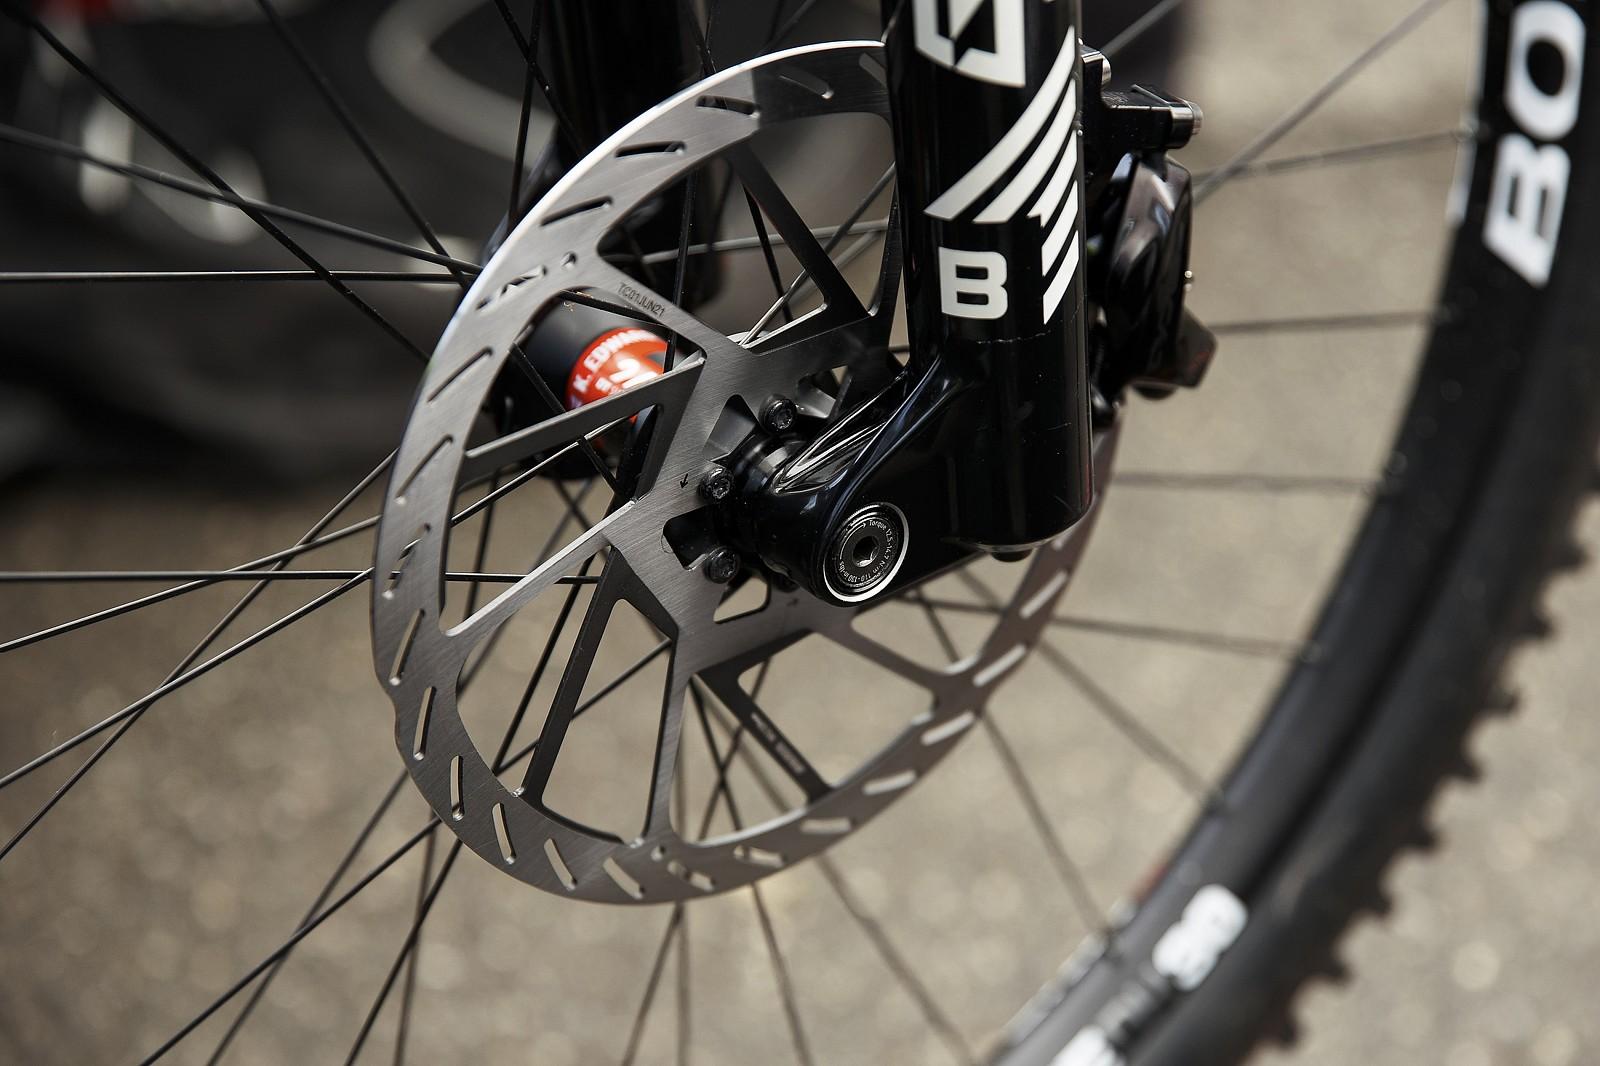 New SRAM 220mm rotors on Trek Factory bikes - PIT BITS - Les Gets World Cup Downhill 2021 - Mountain Biking Pictures - Vital MTB